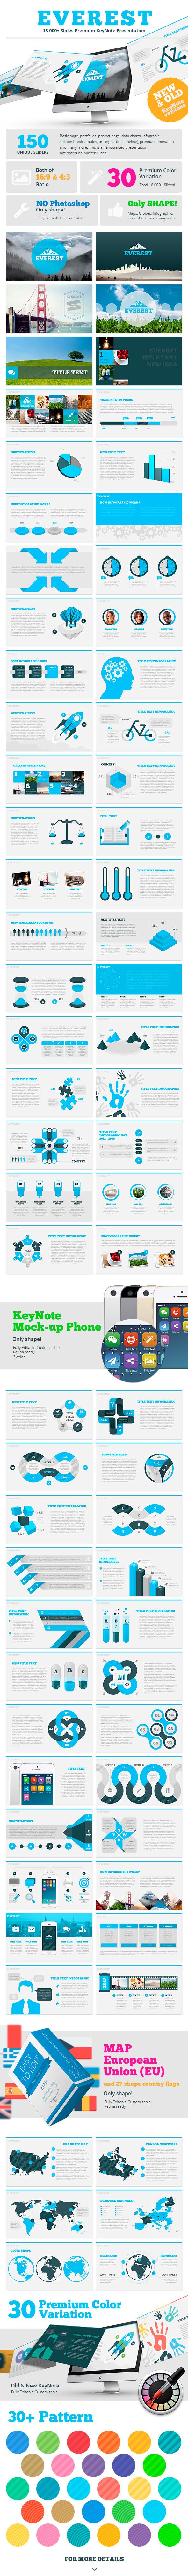 GraphicRiver Everest KeyNote 8950885